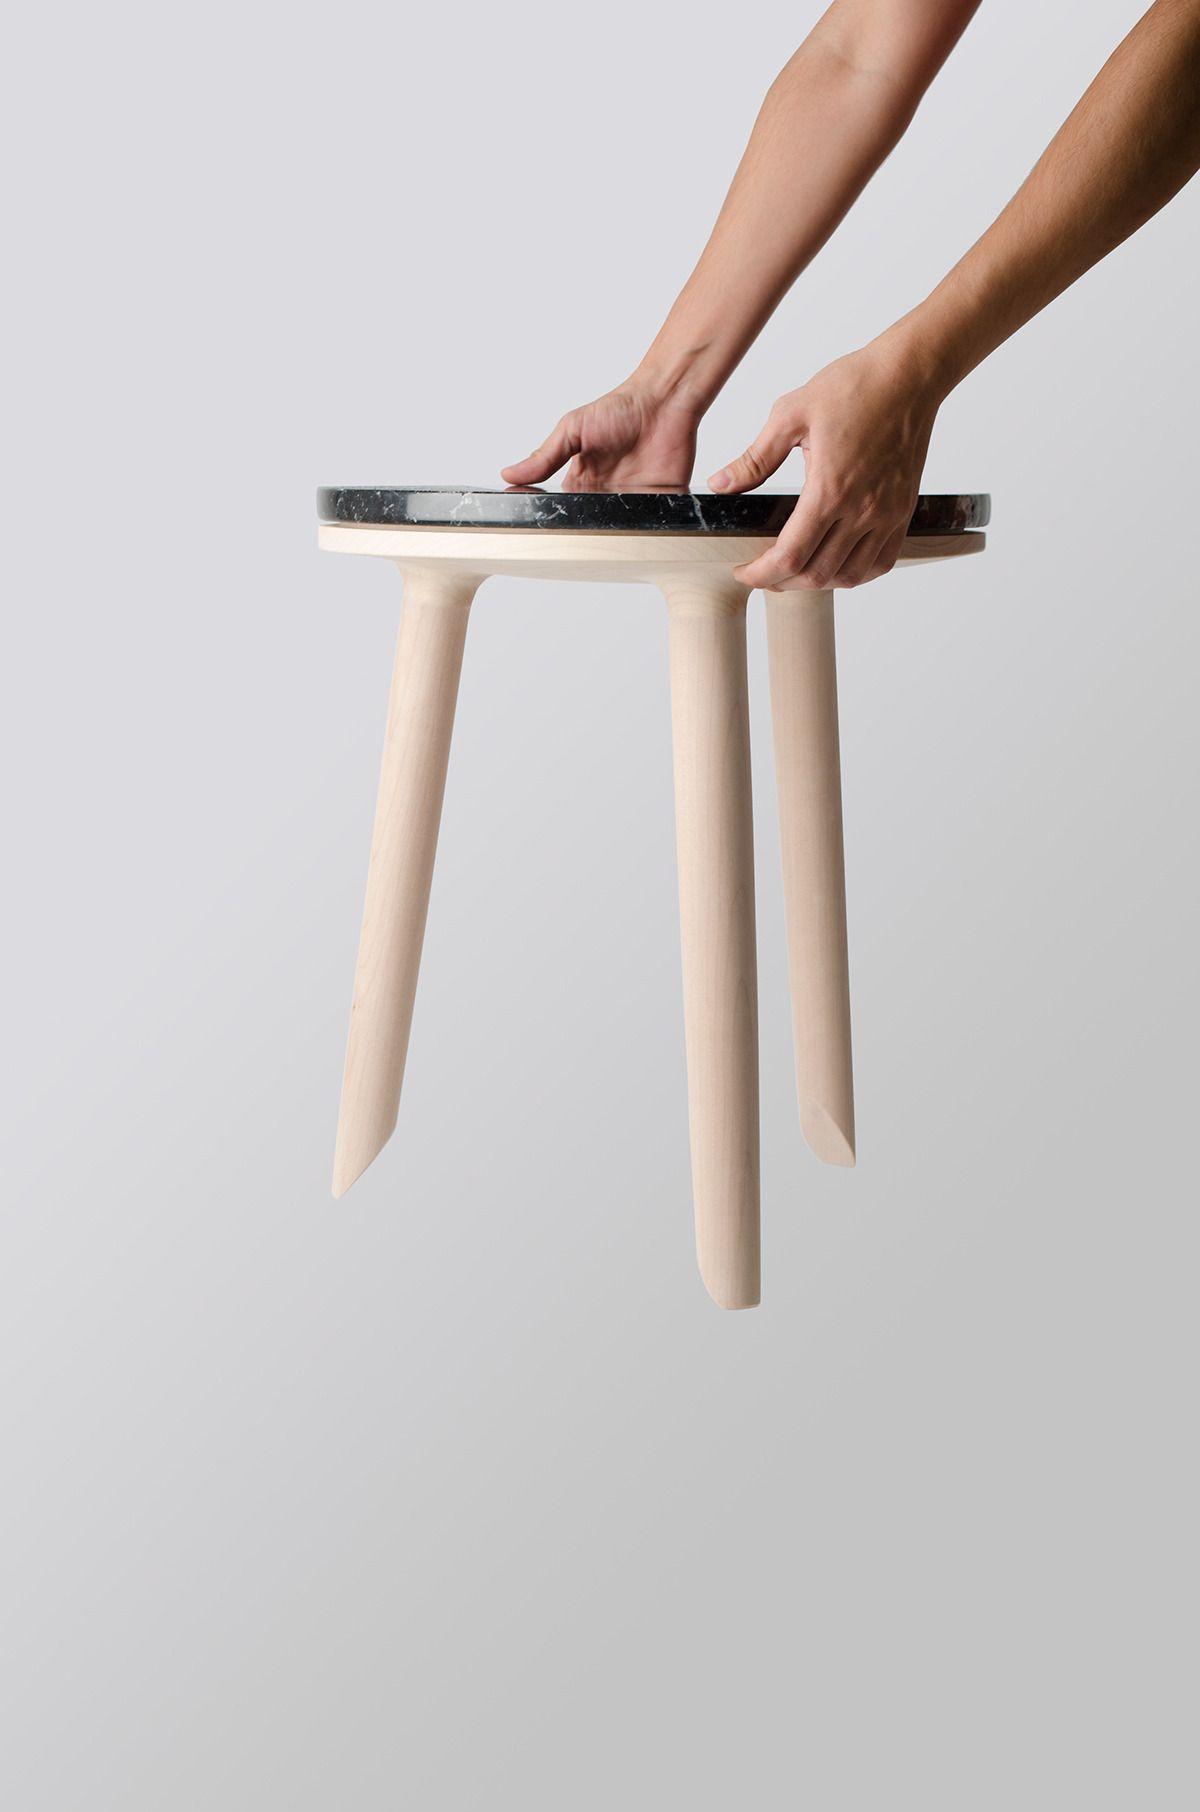 H E I D E G G E R Stool Sidetable By Yolanda Alarcón Logocore White Leather Dining Chairs Beach Chair Umbrella Boho Chair